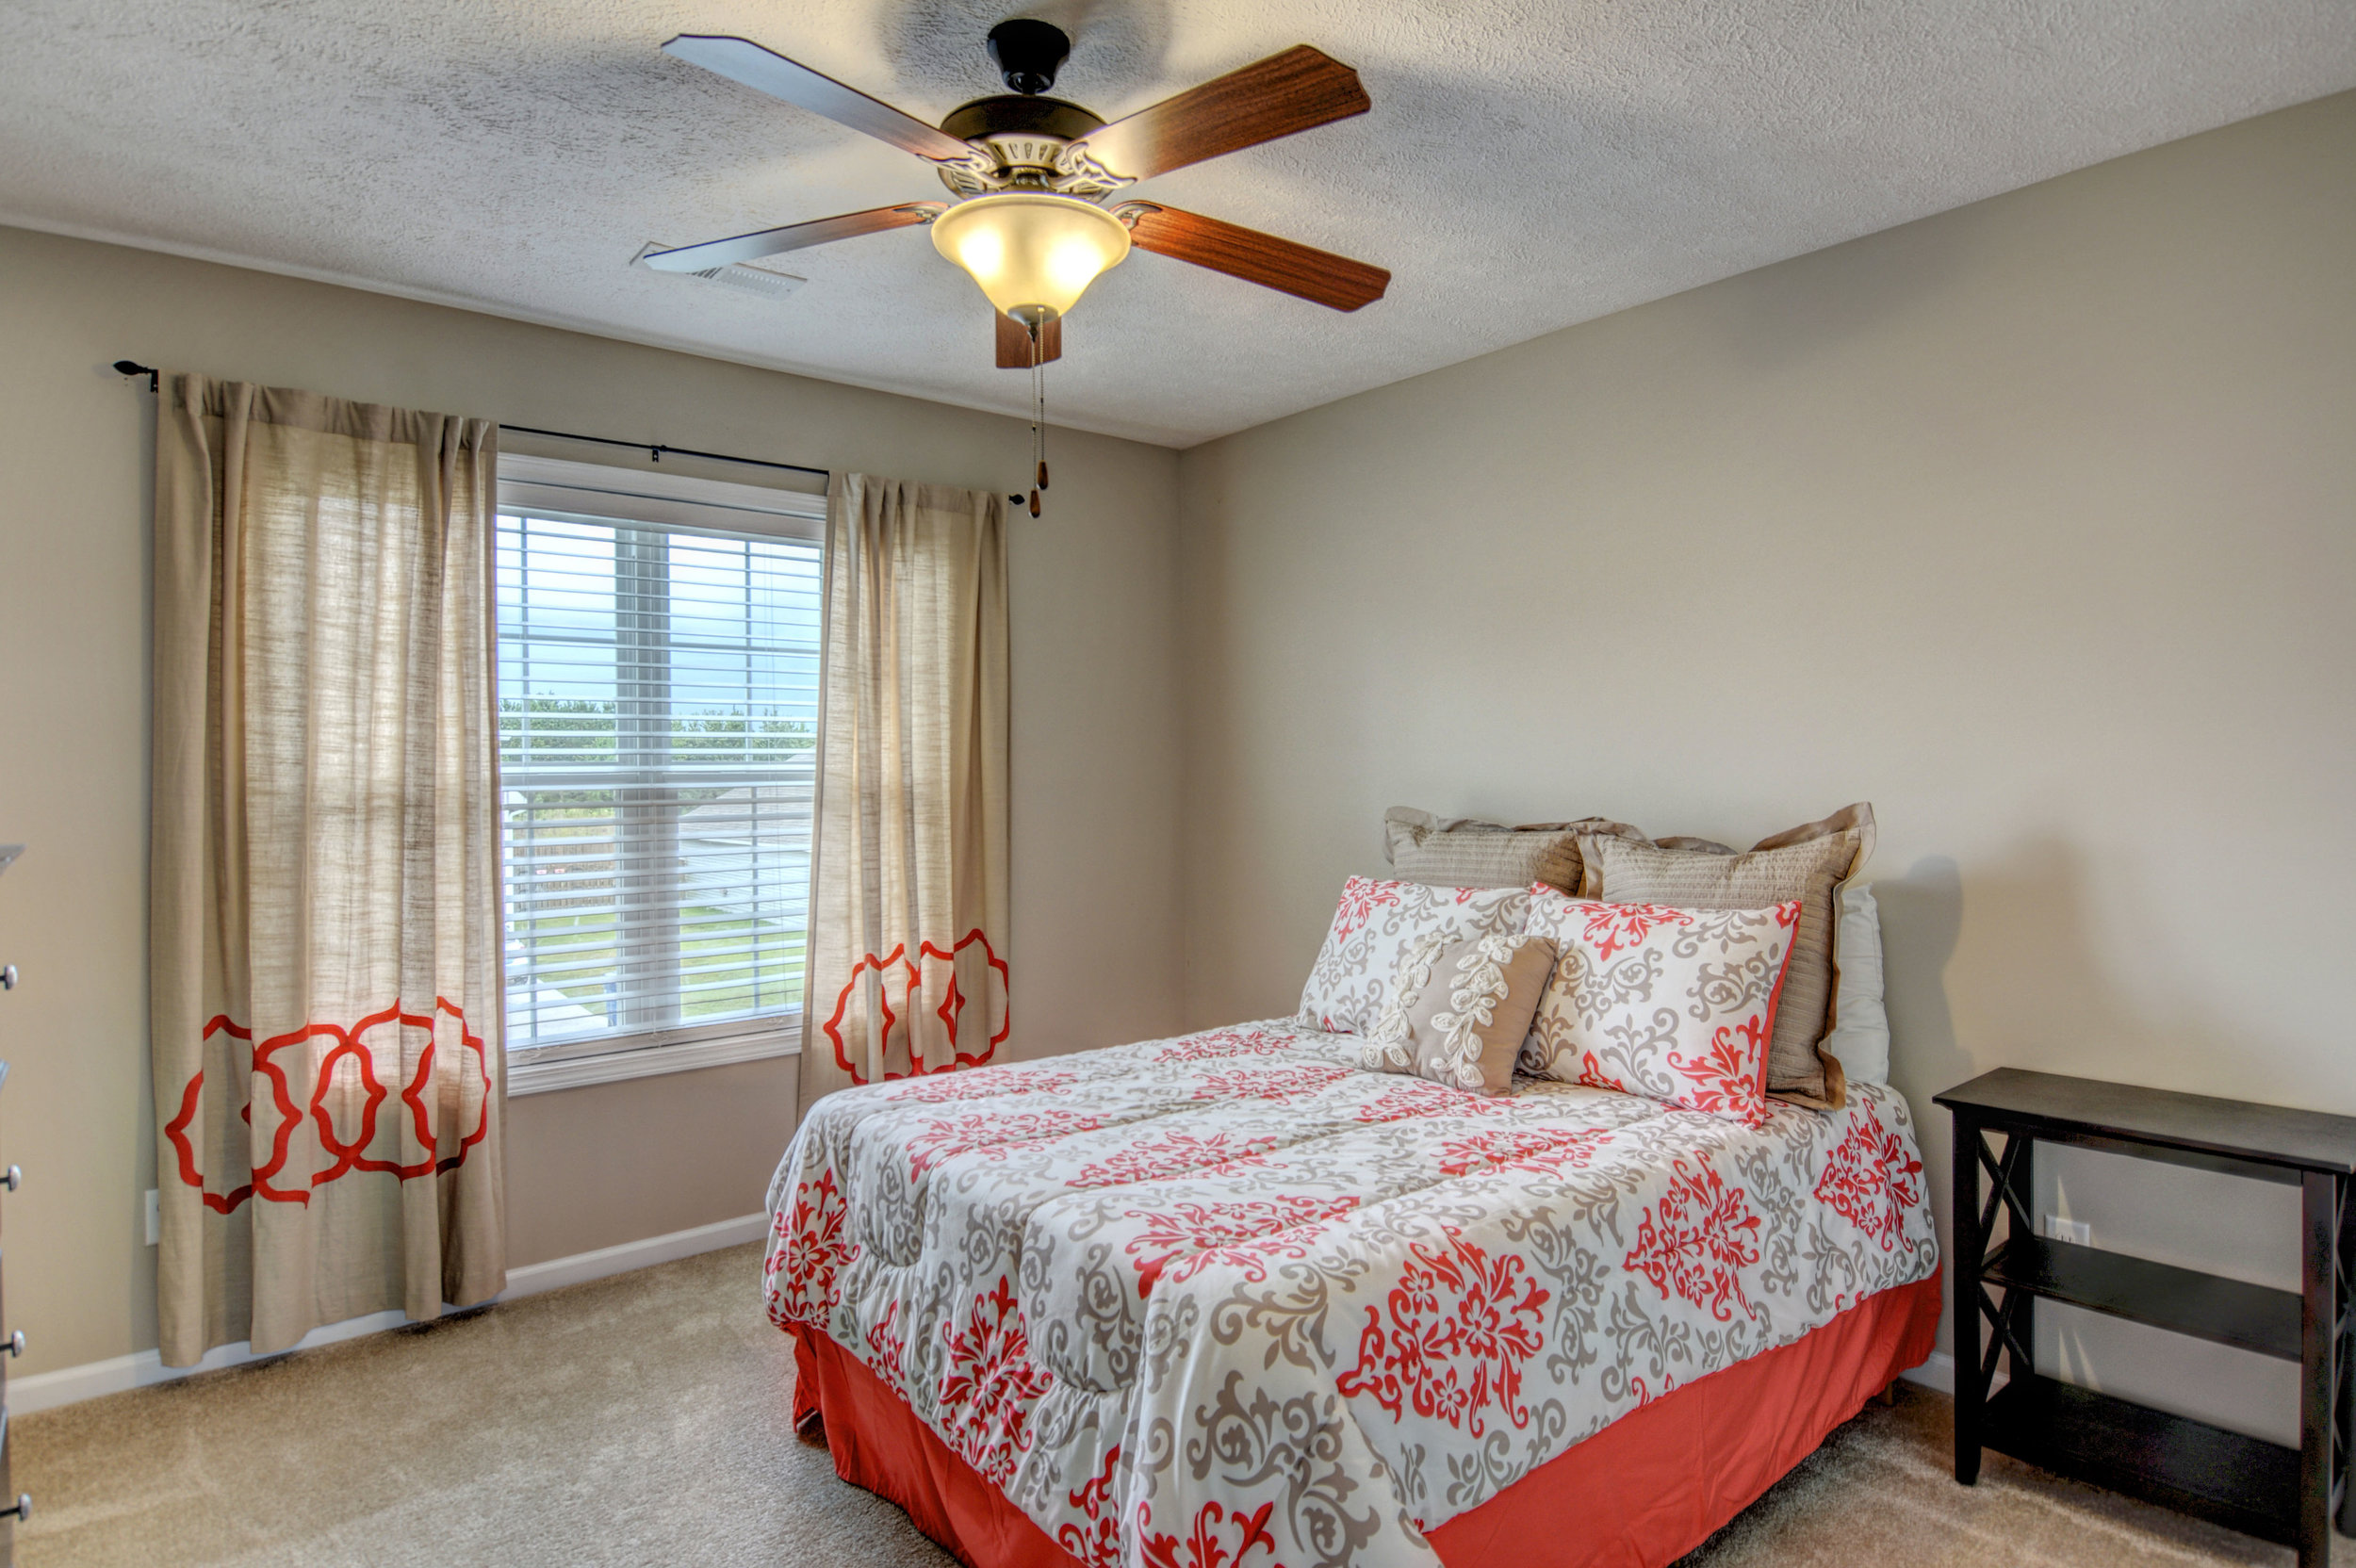 337 Sonoma Rd Jacksonville NC-print-029-19-DSC 5551 2 3-4200x2796-300dpi.jpg